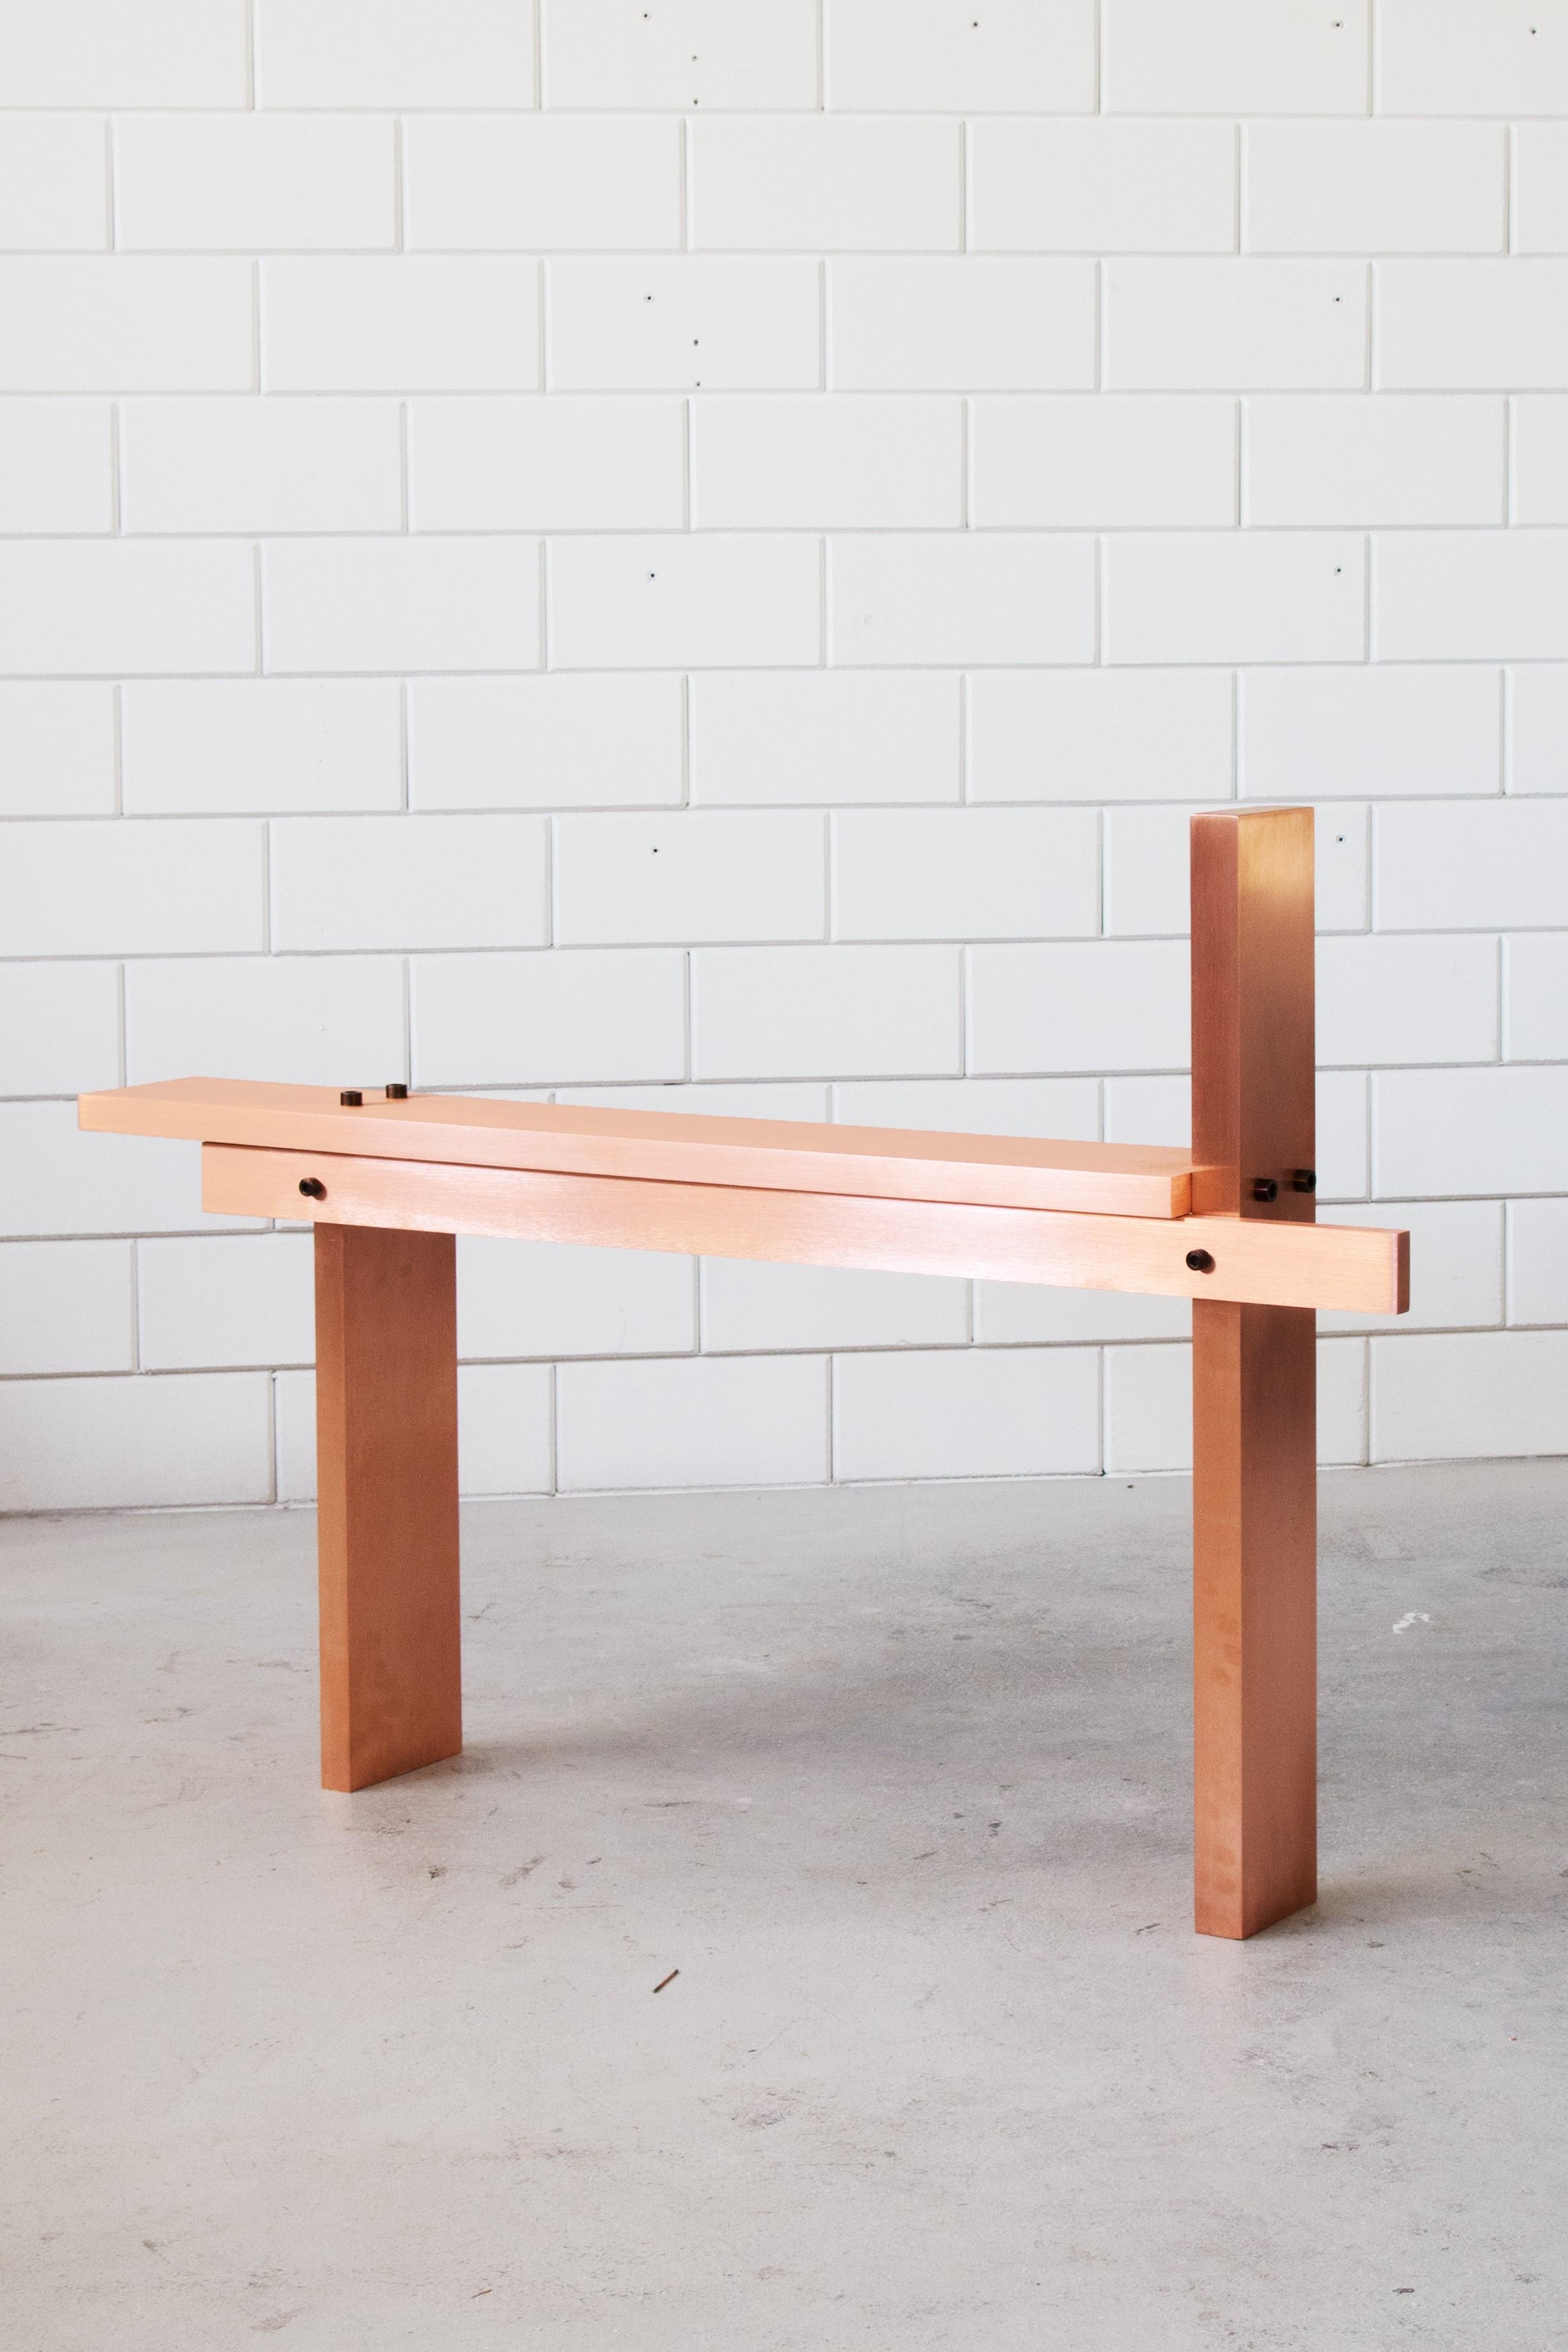 Minimalist CB01 Bench by Johan Viladrich